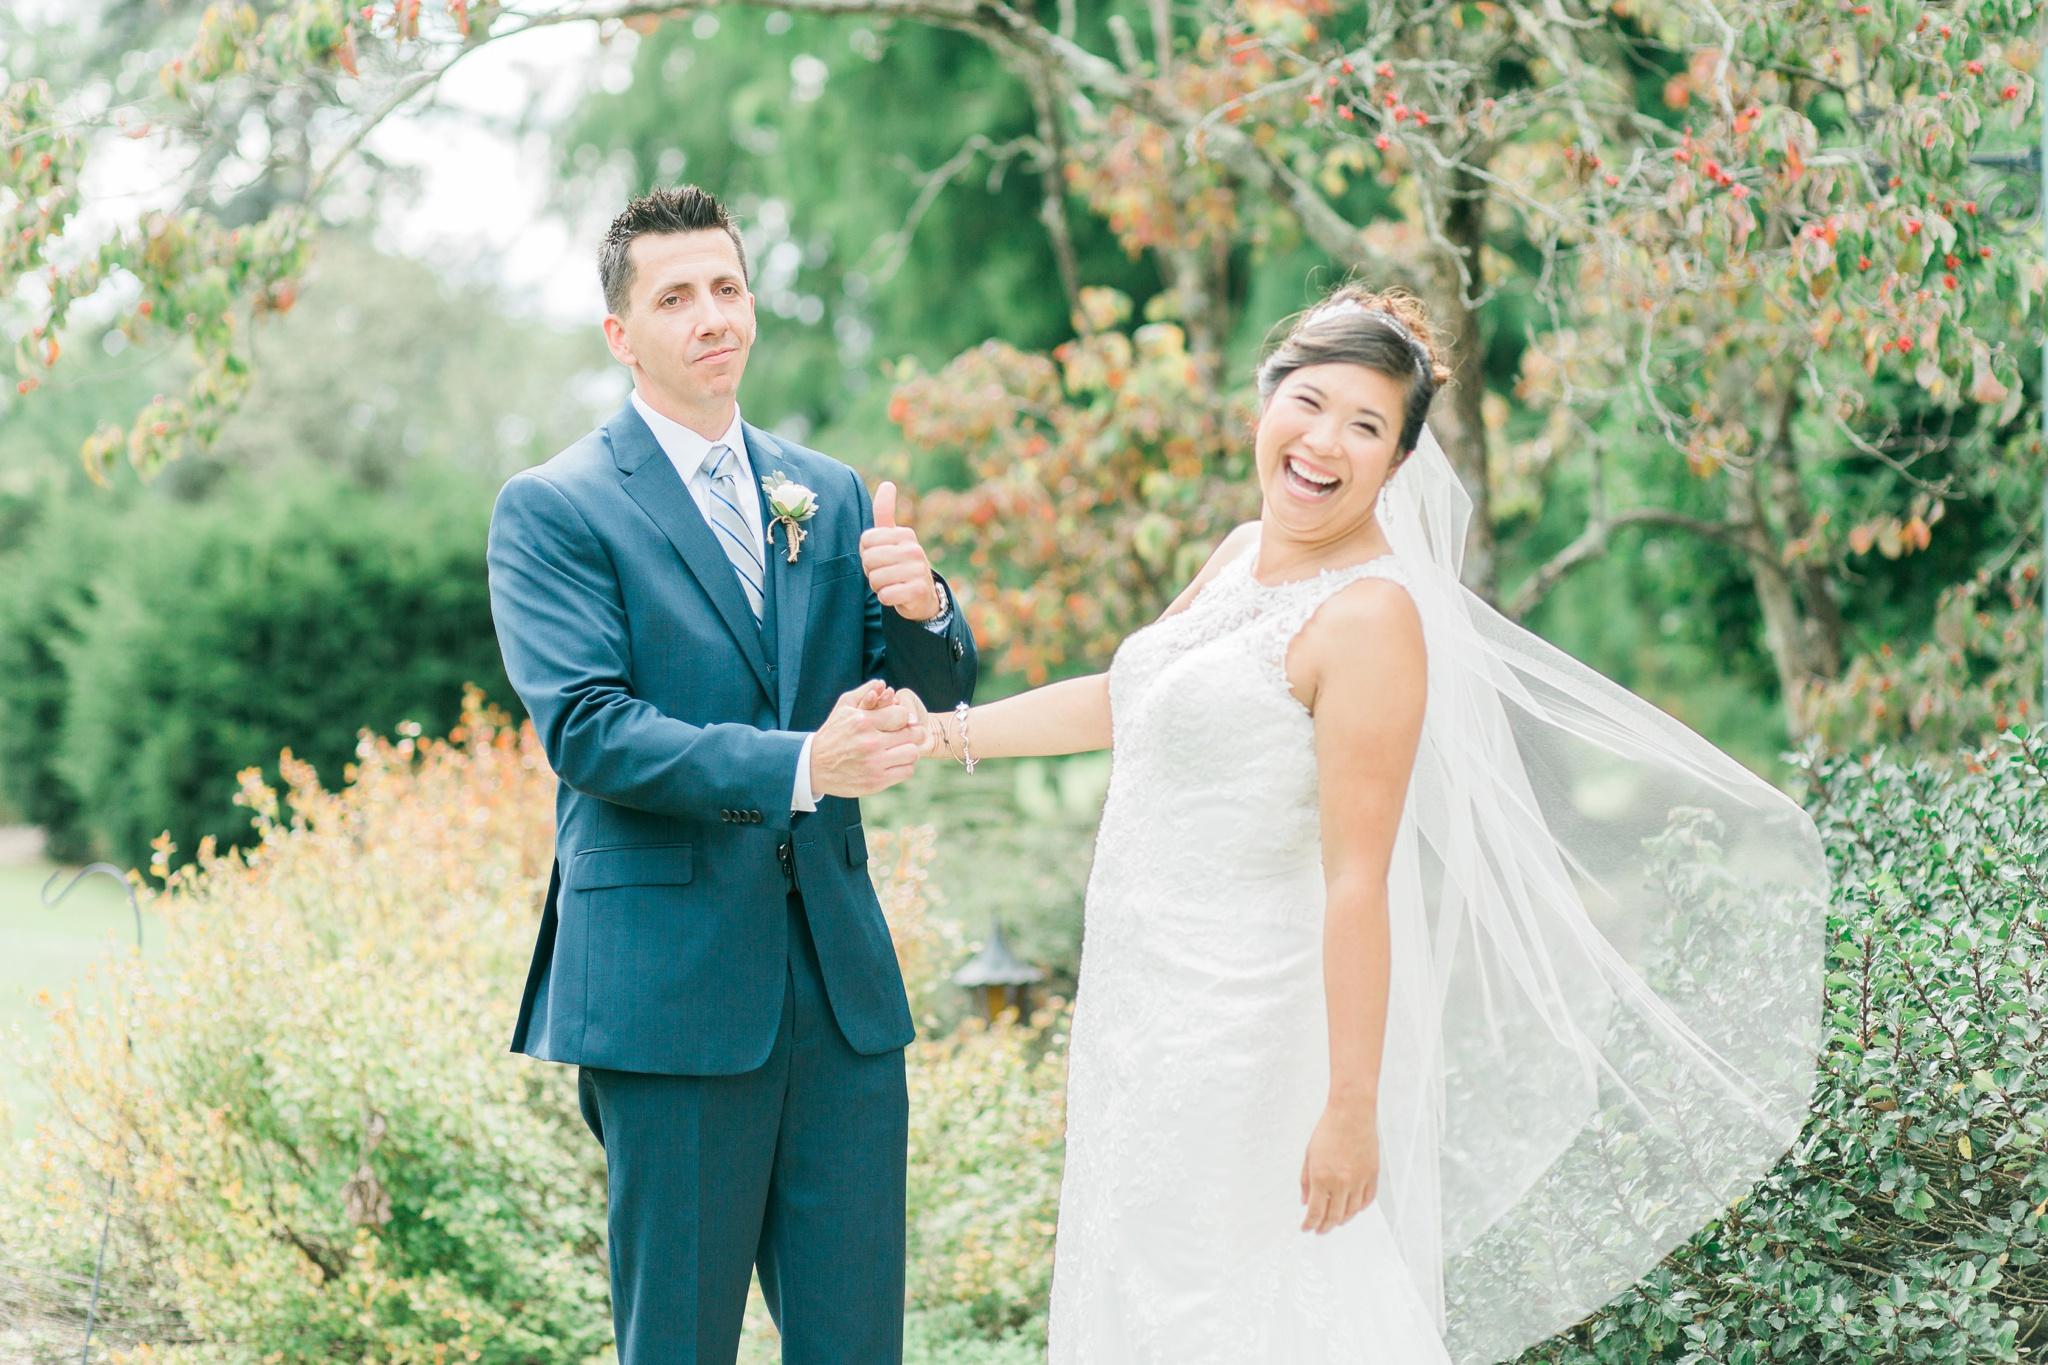 beverly-mansion-wedding-marengo-ohio-photographer_0019.jpg